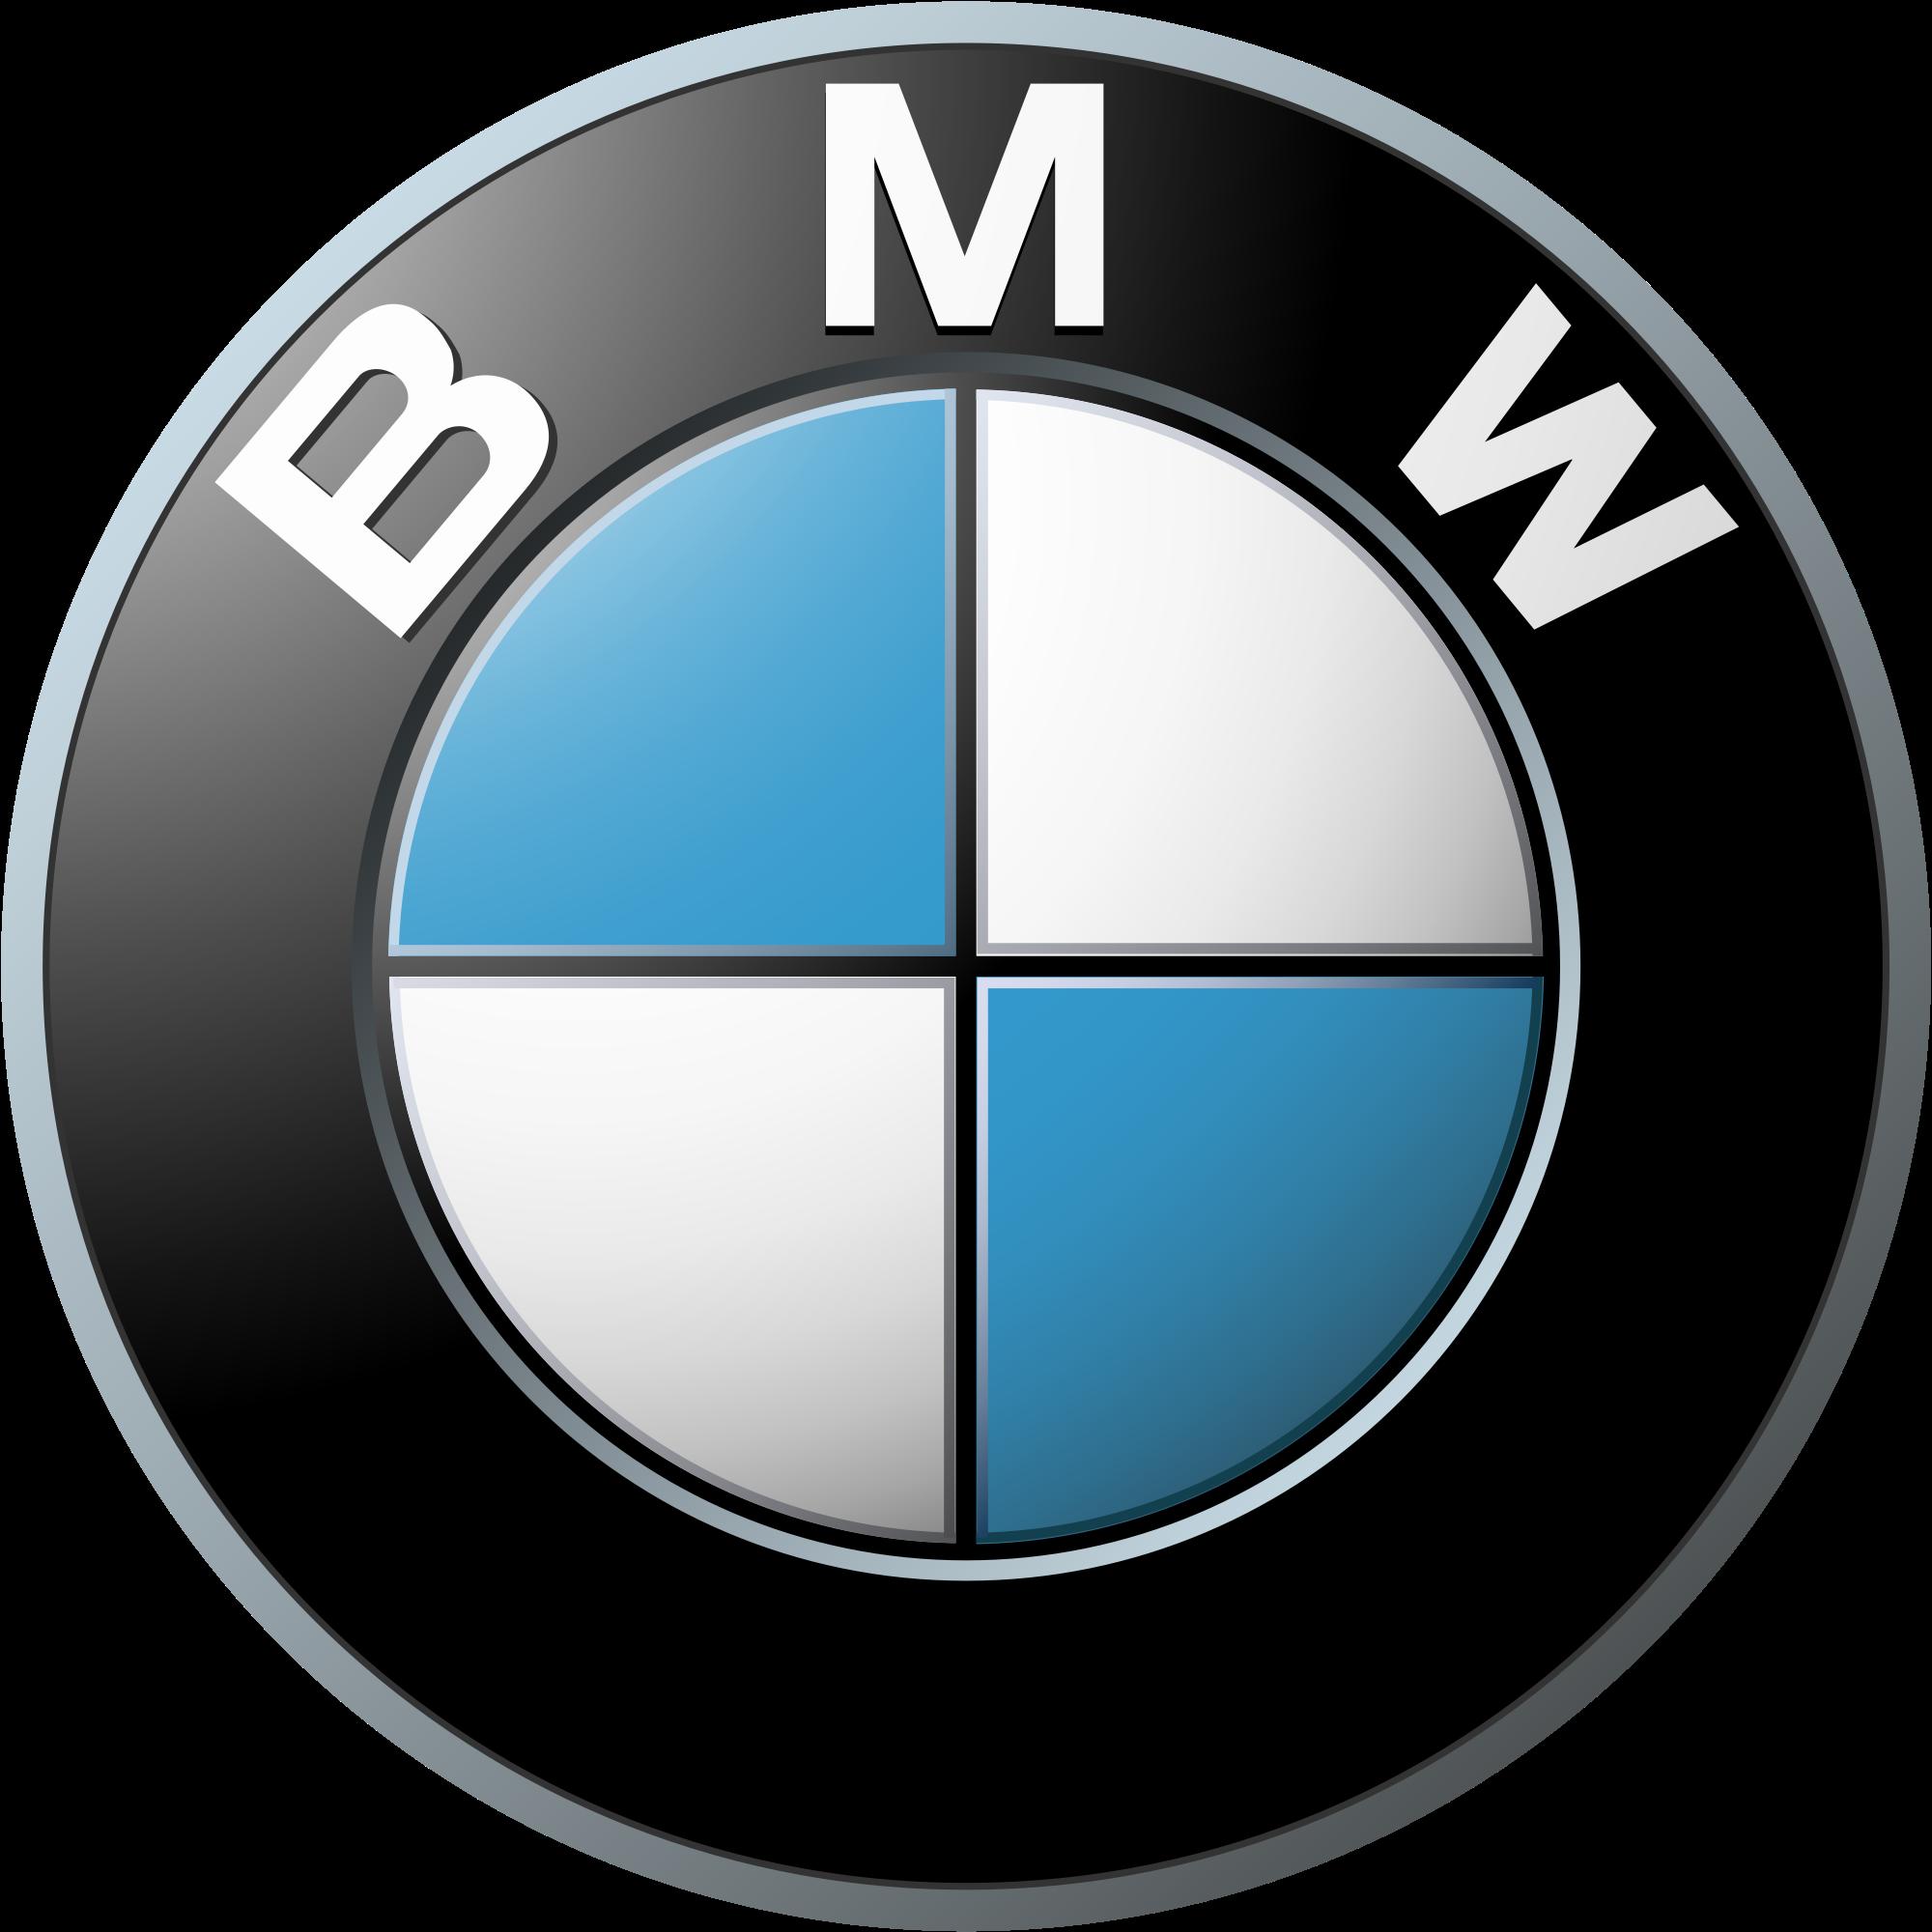 BMW логотип PNG